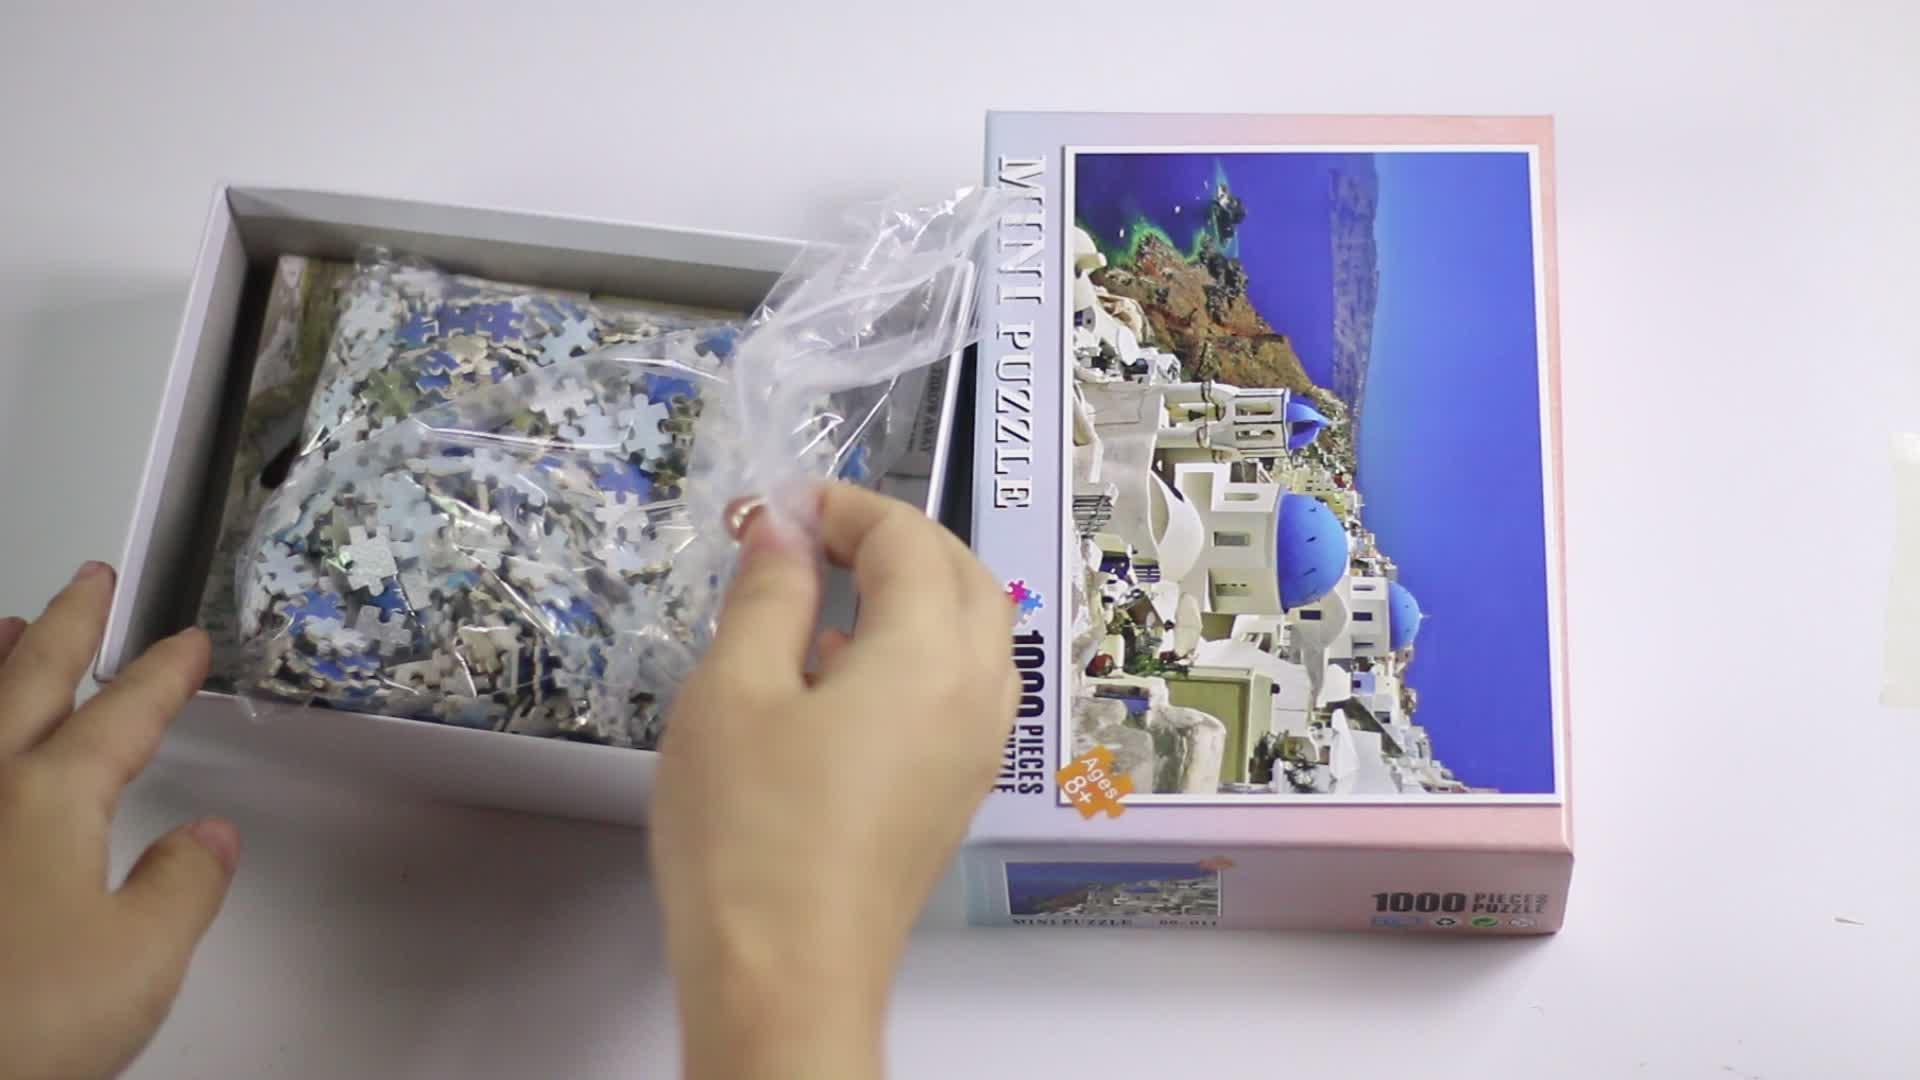 YMK במלאי 1000 חתיכה מיני קרטון פאזל נייר פאזל משחקים במלאי סיטונאי